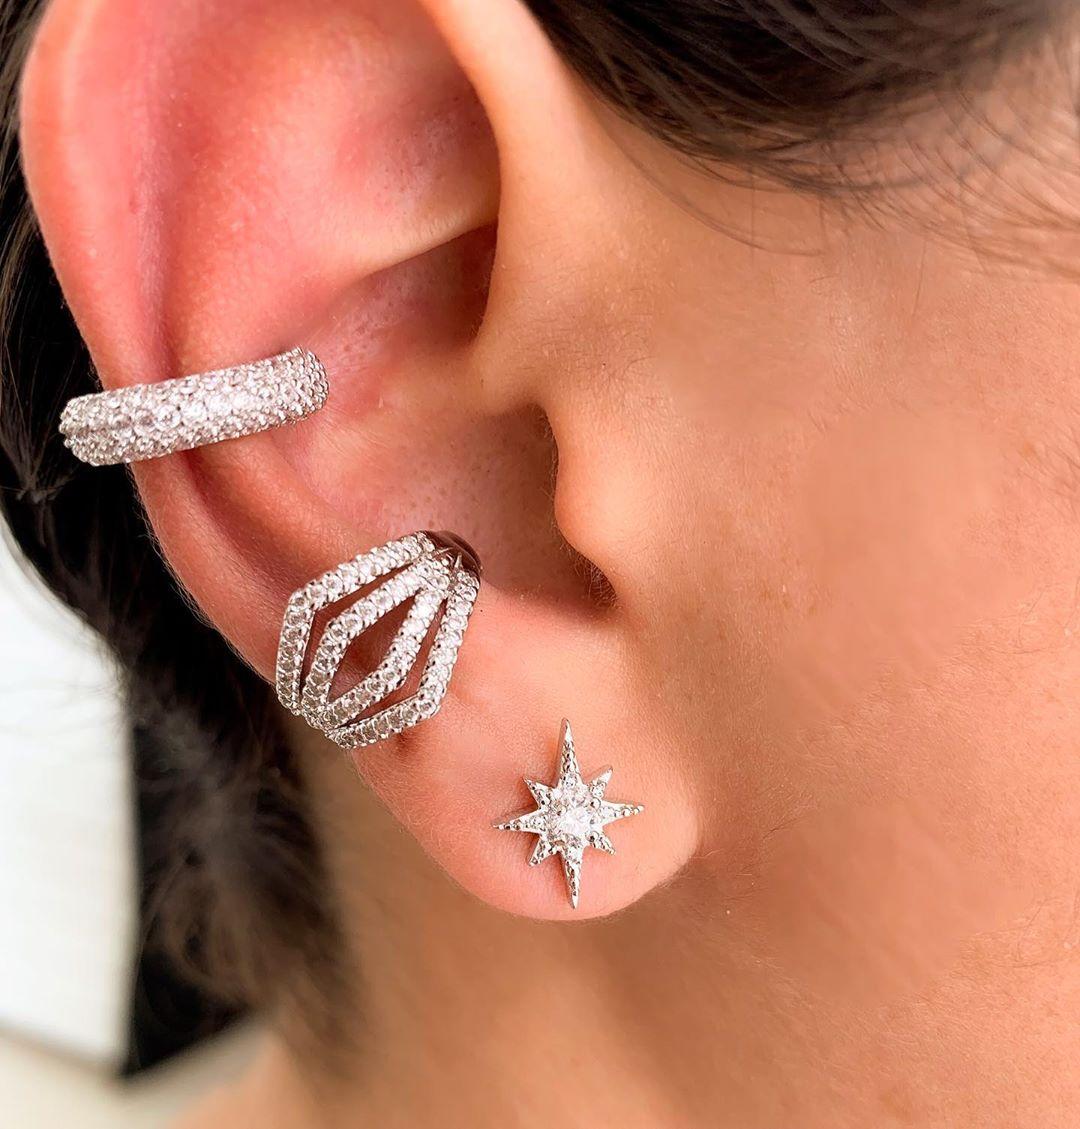 piercing conch duplo